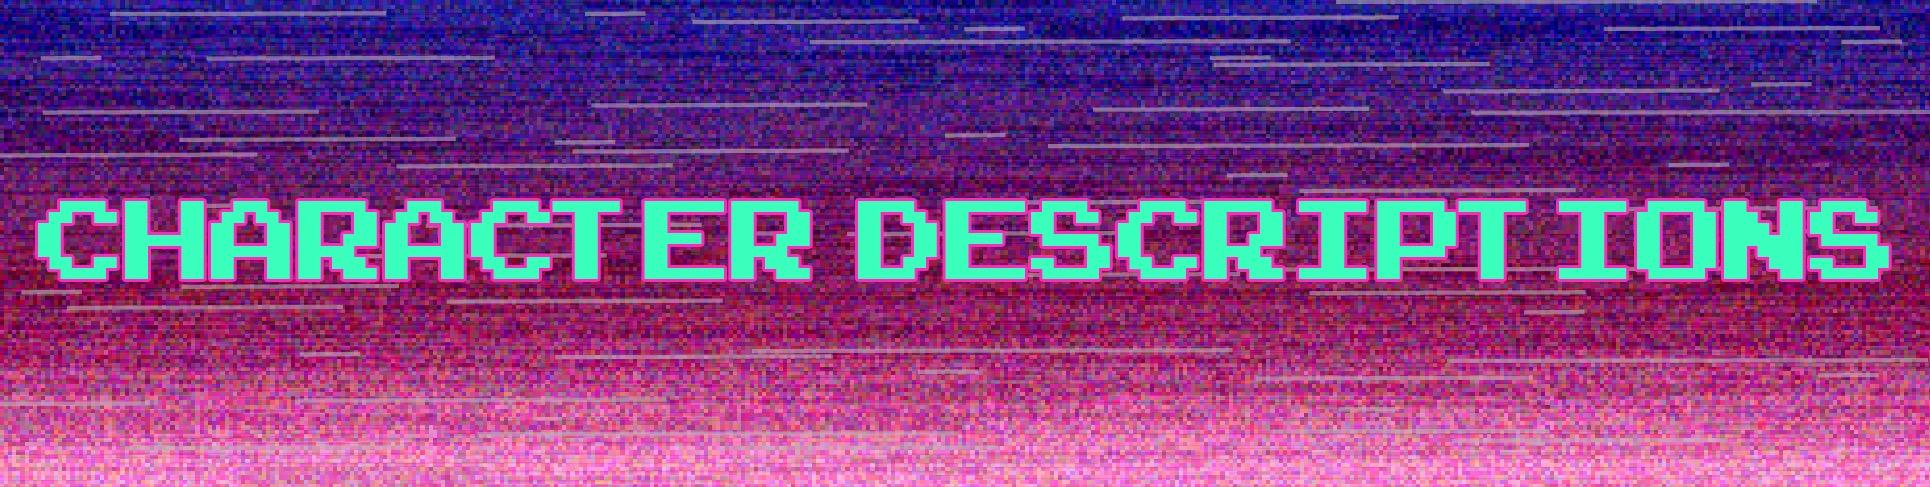 characterdescrip.jpg